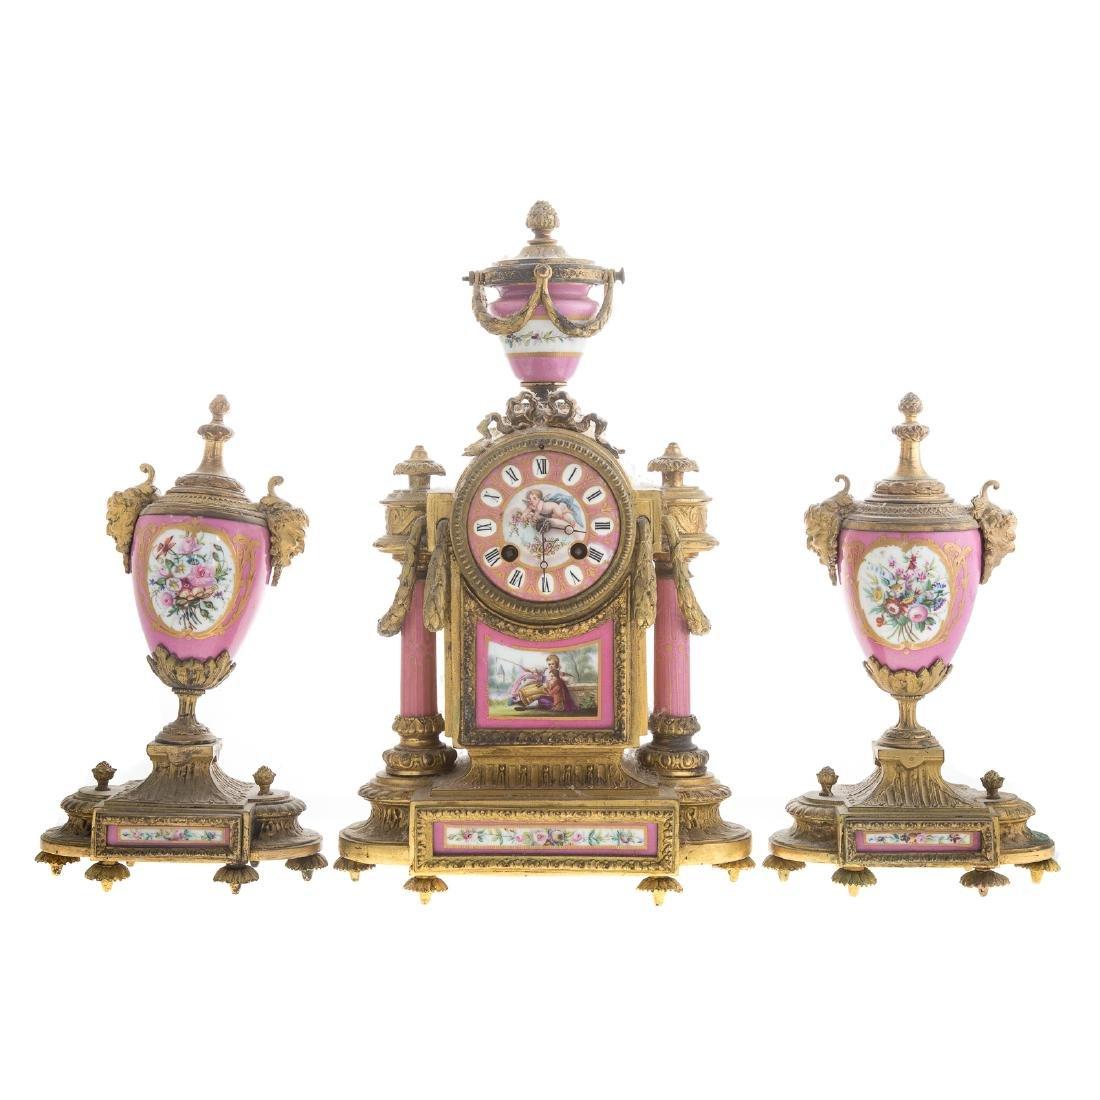 Phillipe H. Mourey gilt-metal clock garniture